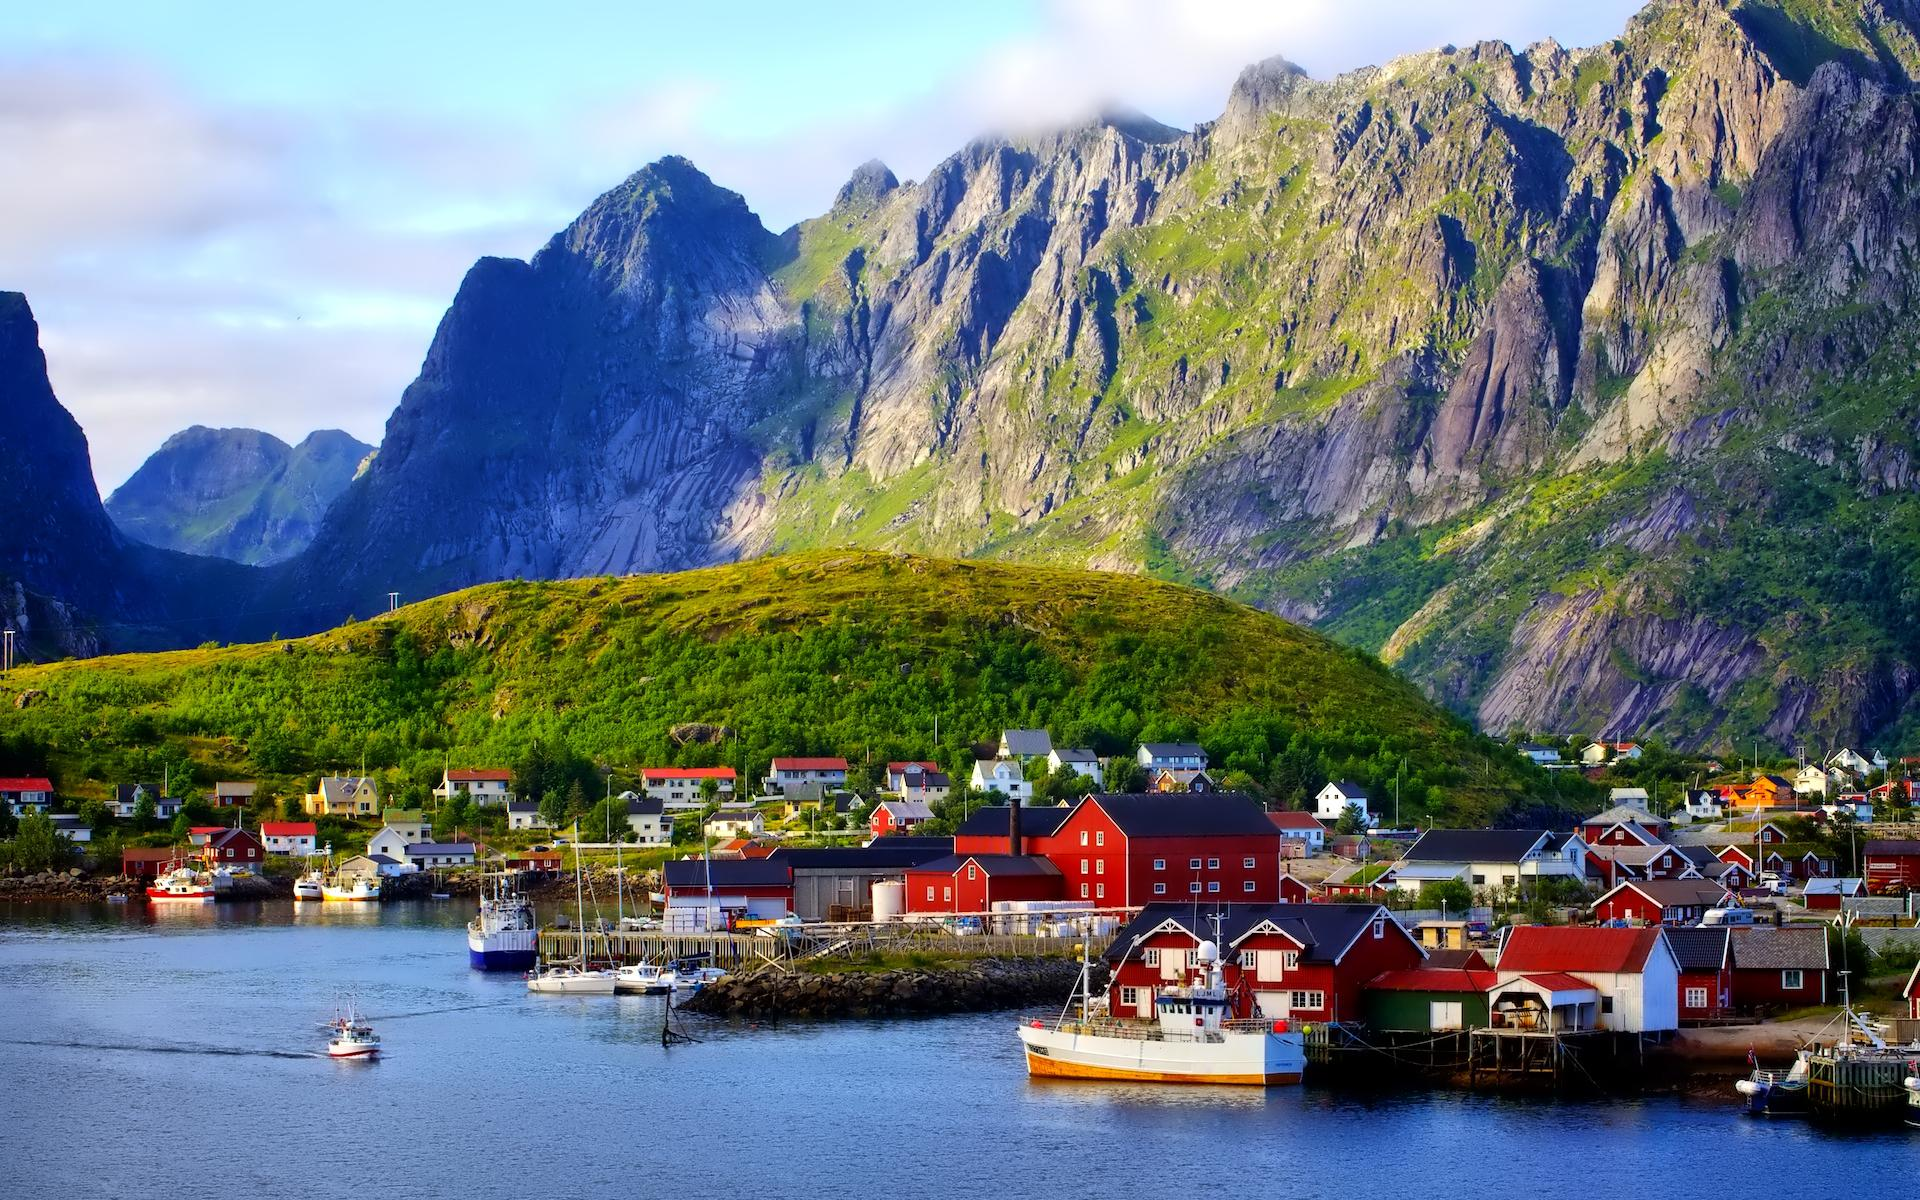 Pigūs skrydžiai į Norvegiją